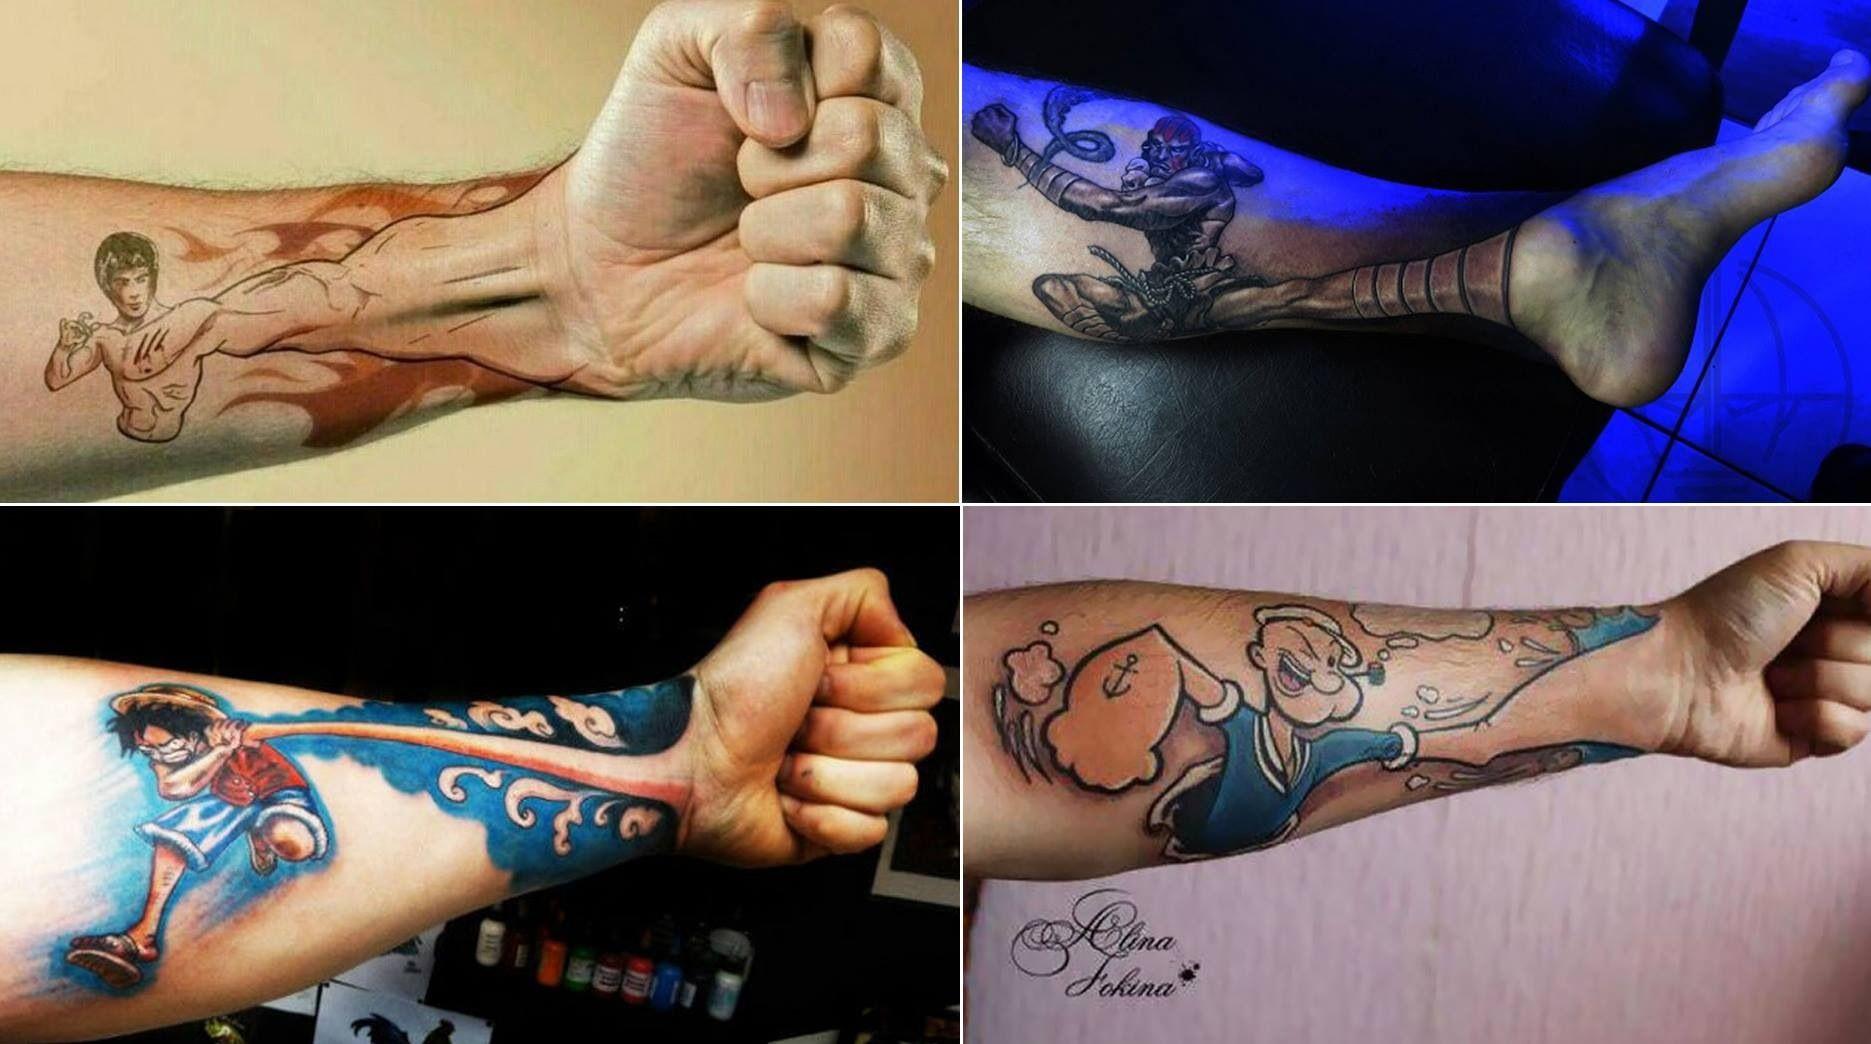 One Piece Hand Tattoo: Awesome Tattoos. Popeyes Tattoo, Bruce Lee Tattoo, One